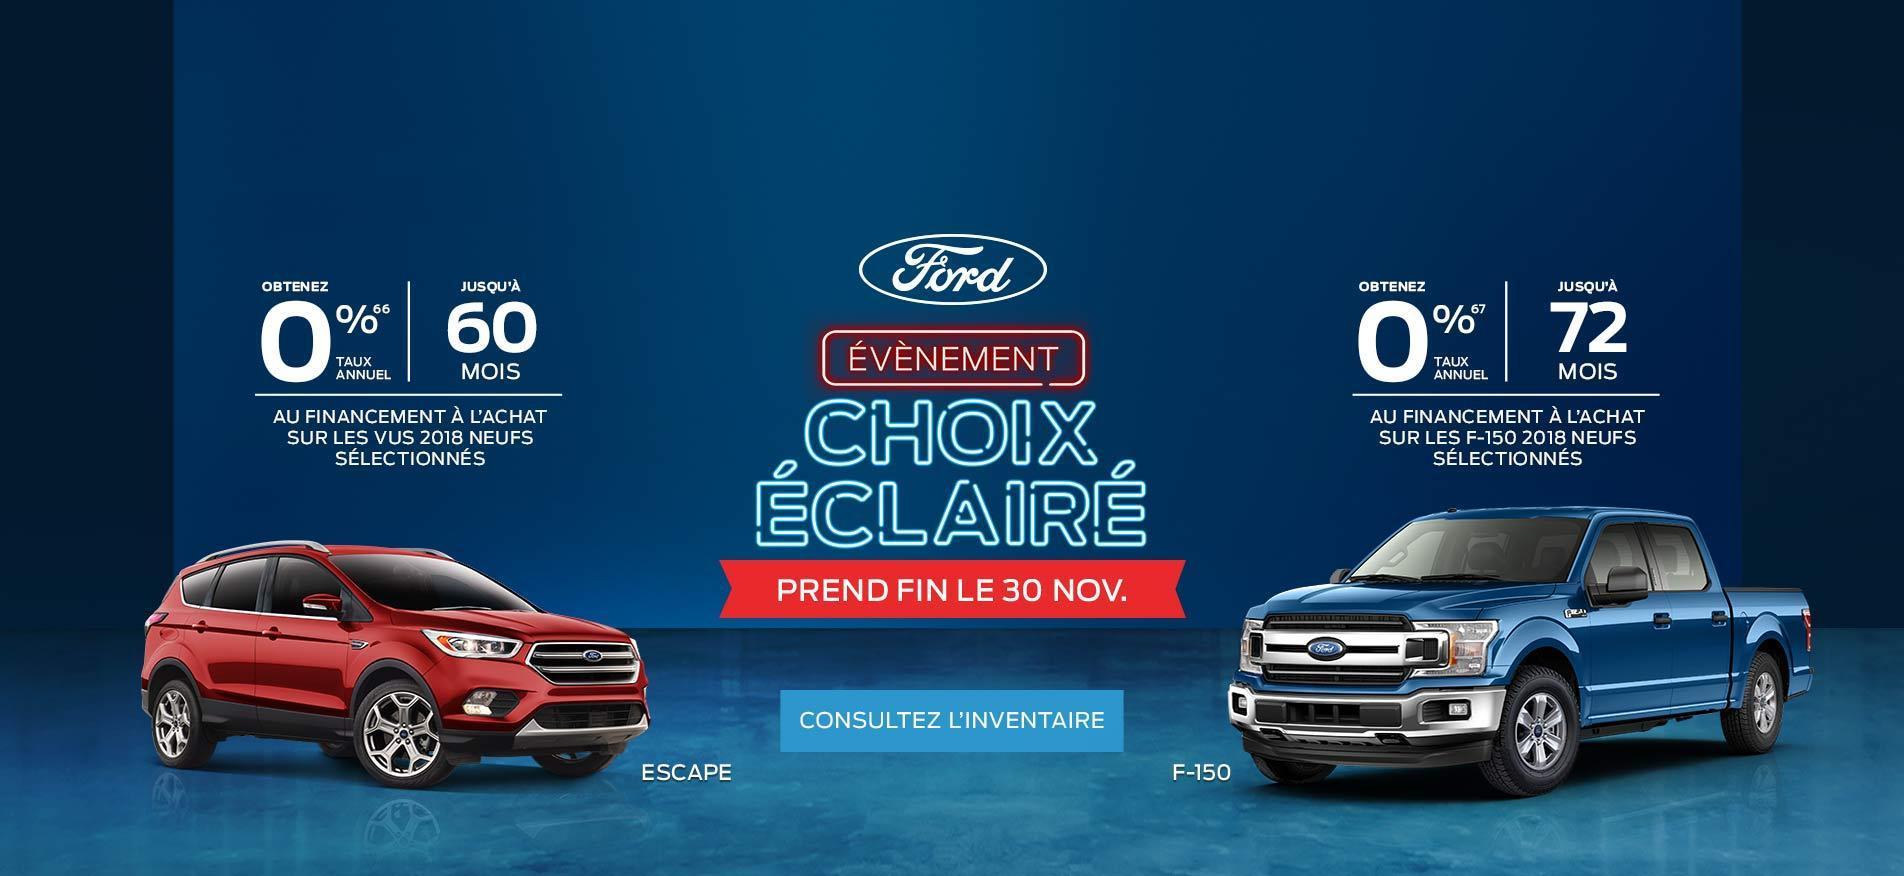 La Perade Ford Choix éclairé